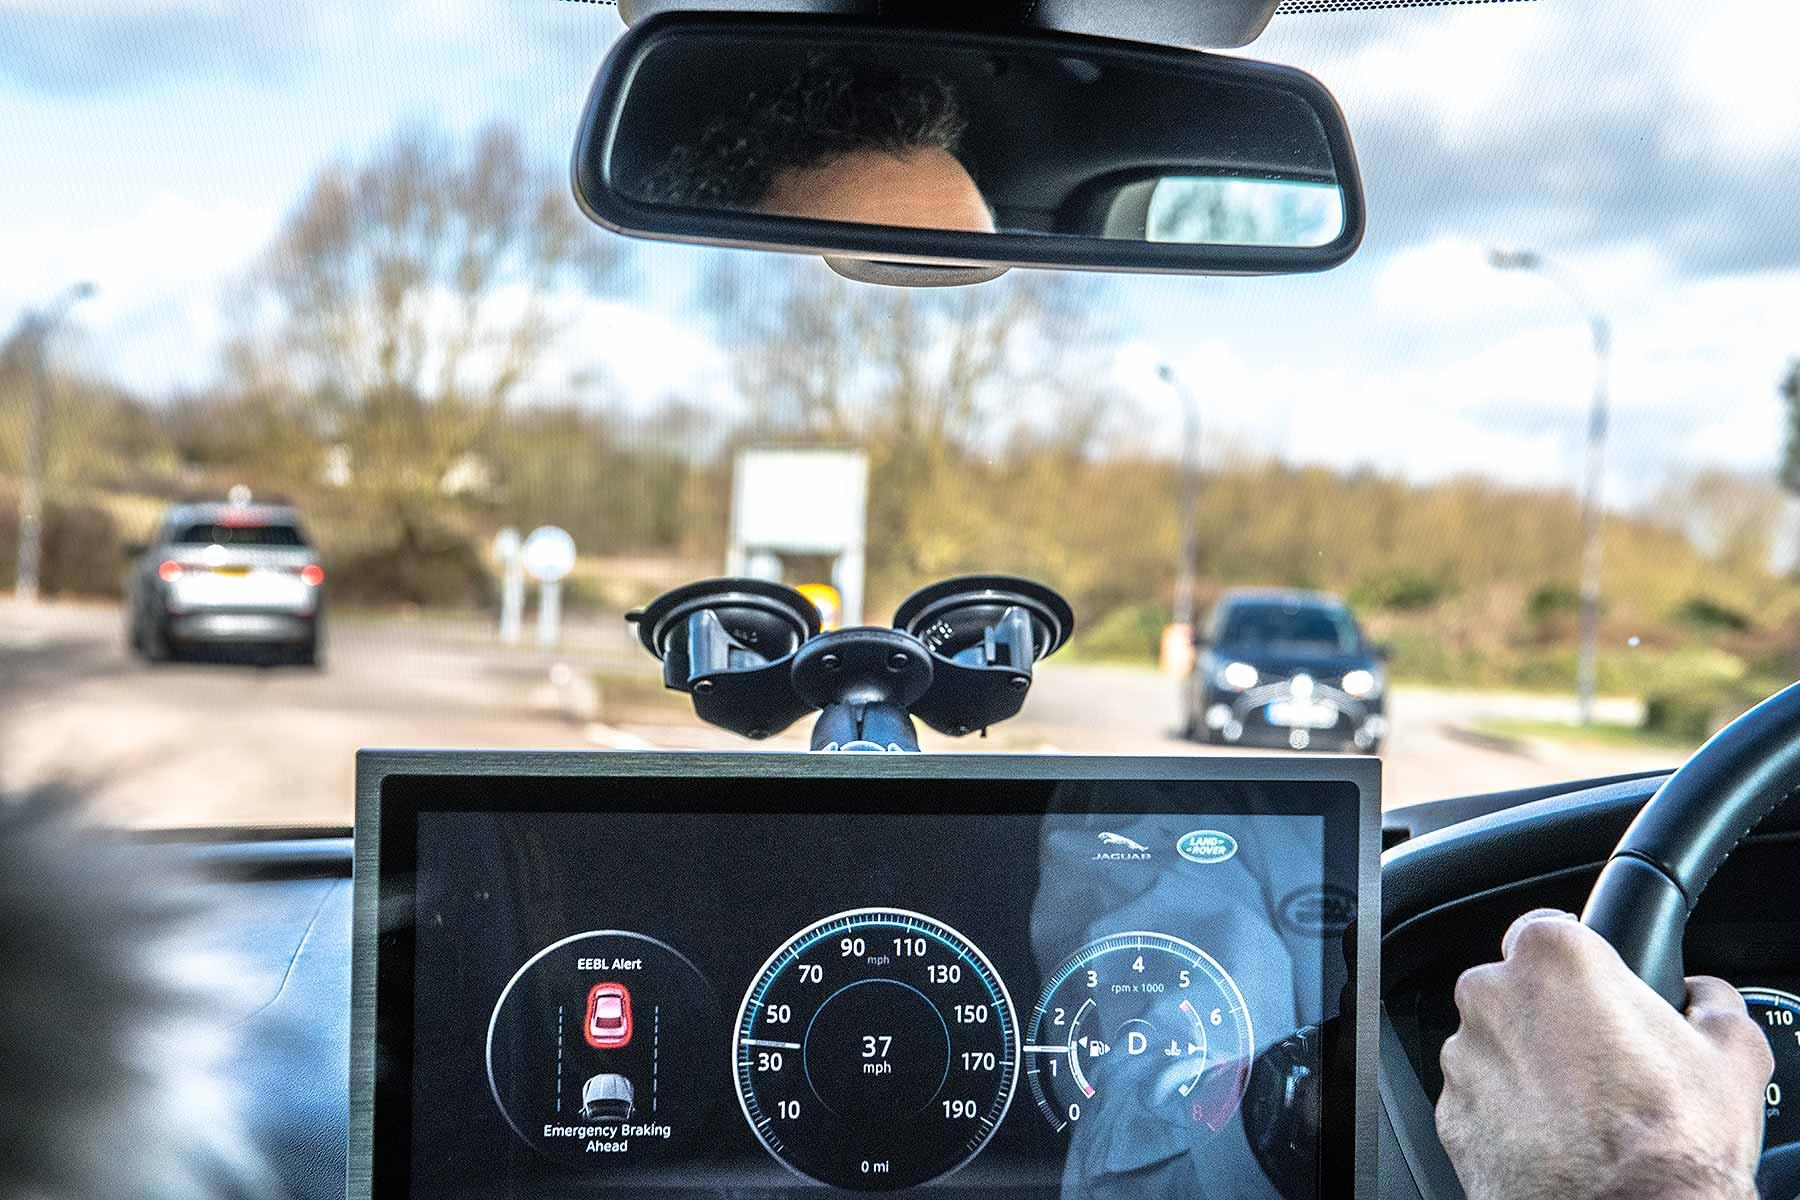 Self-driving Jaguar Land Rovers in Milton Keynes